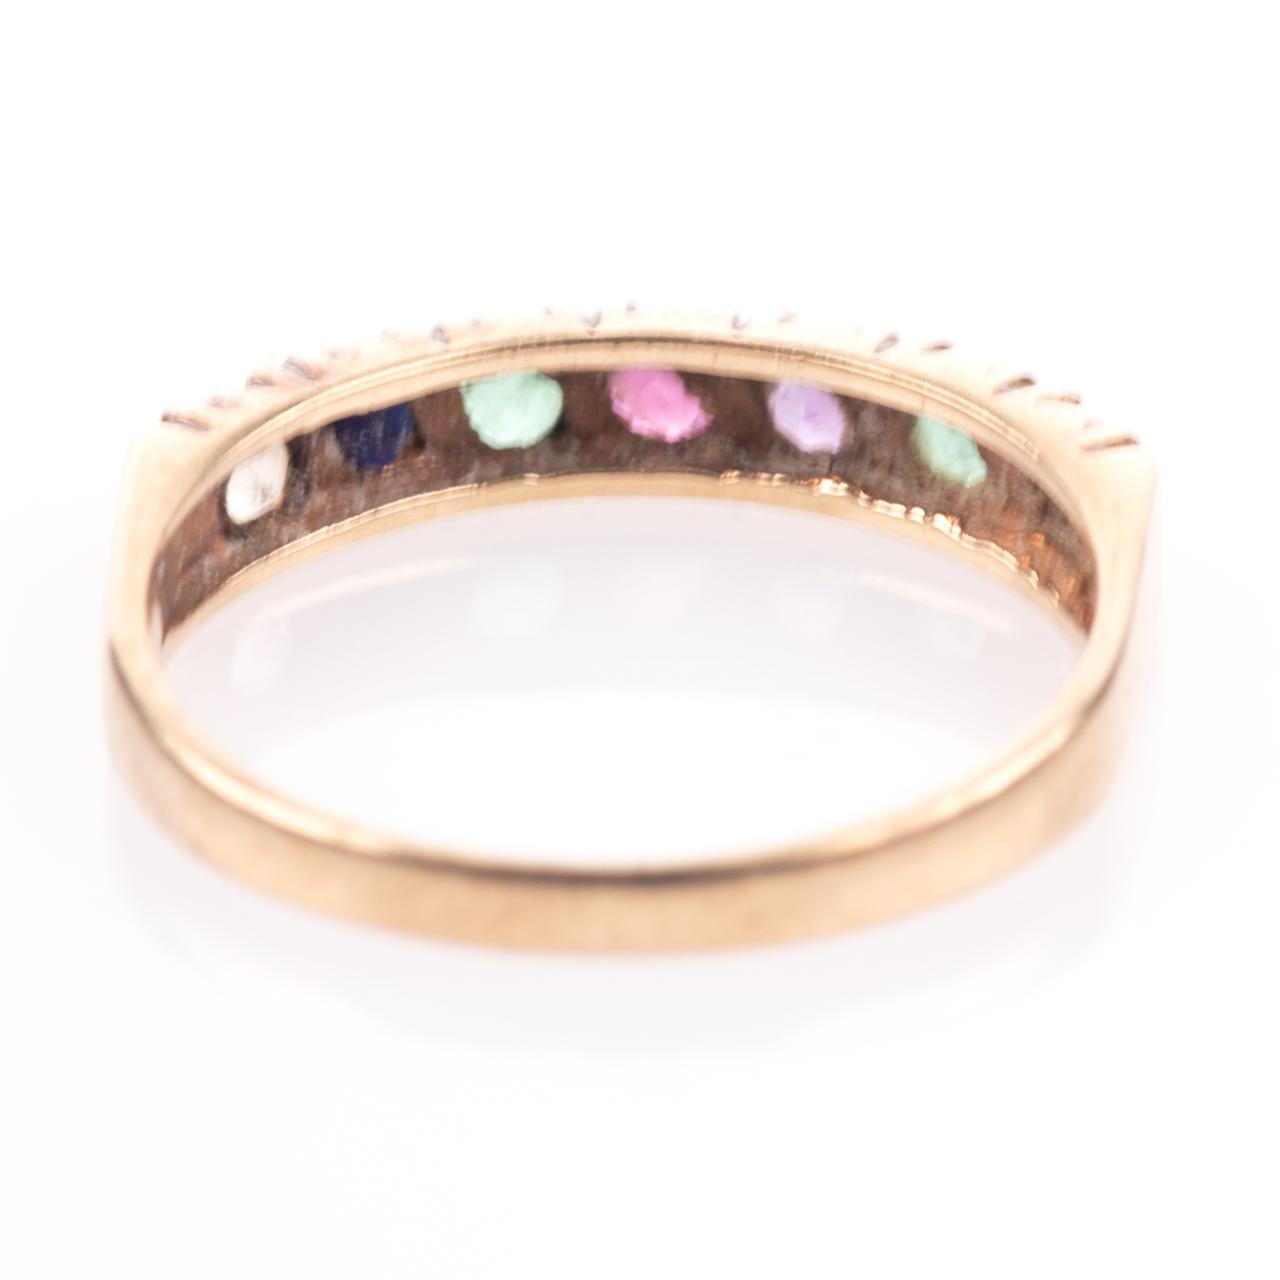 9ct Gold Emerald, Ruby, Amethyst, Sapphire & Diamond Ring - Image 7 of 8